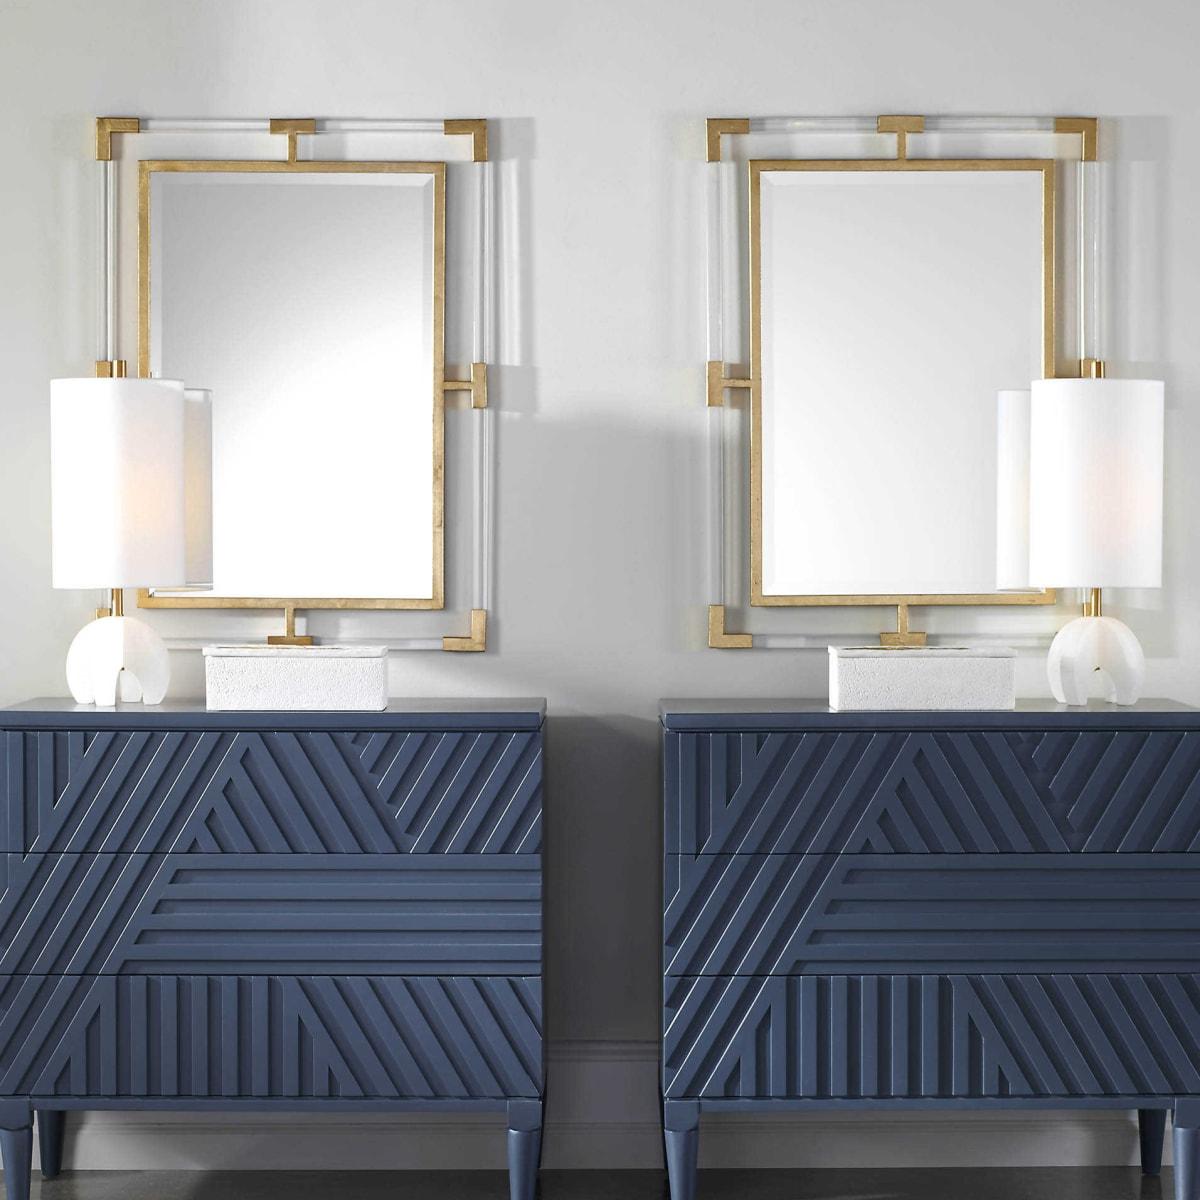 Uttermost 09124 Gold Leaf Balkan Urban Modern Bathroom Mirror With Acrylic And Gold Frame Lightingdirect Com